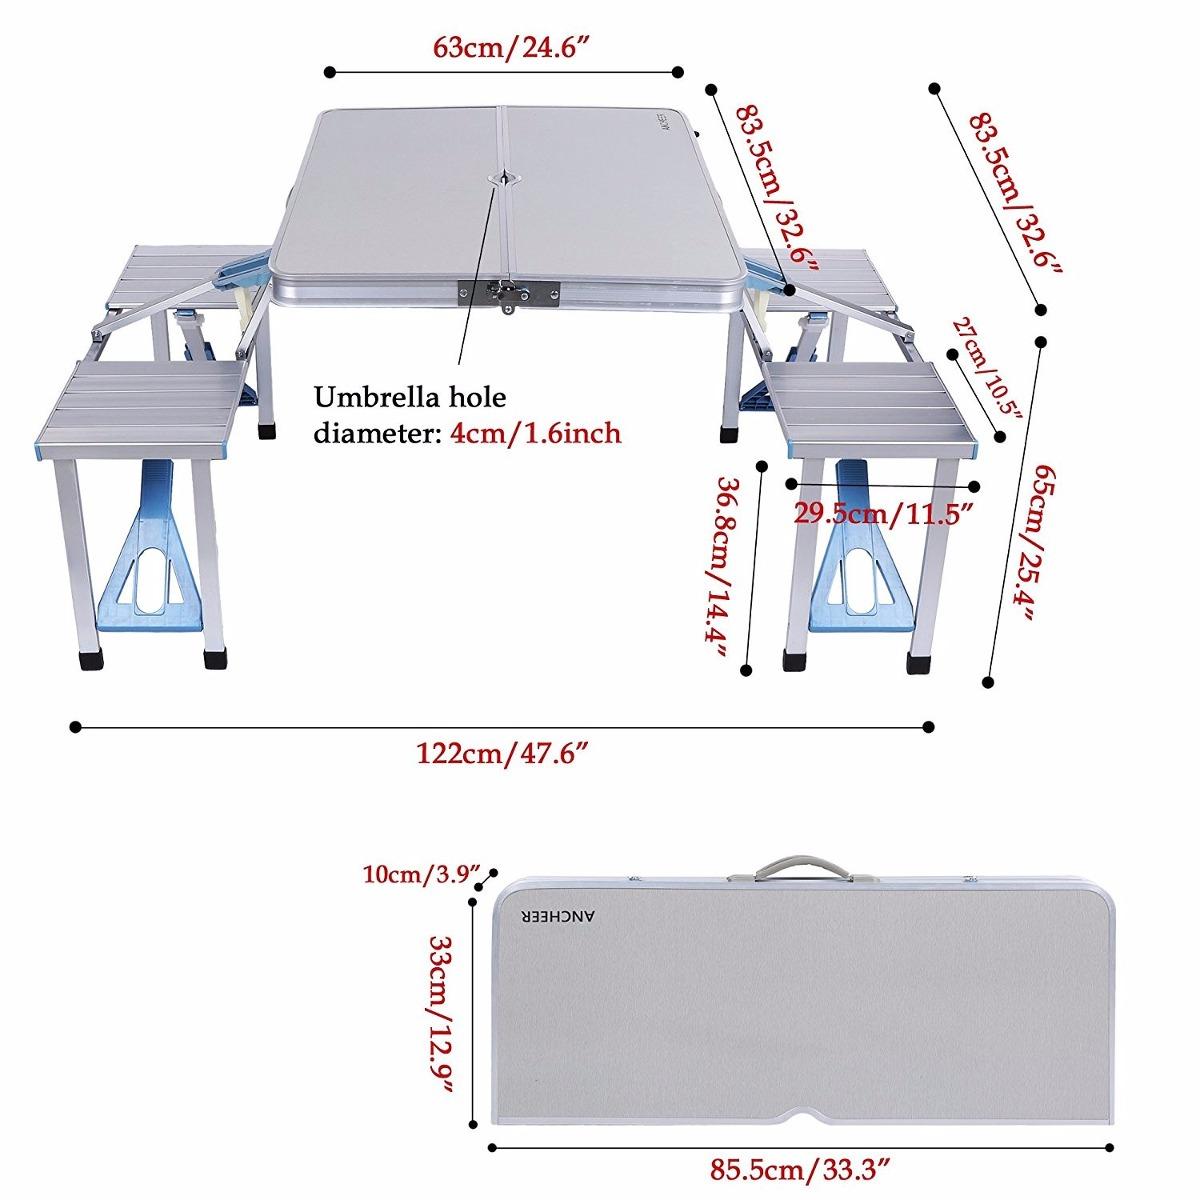 Mesa plegable ancheer aluminio tabla portable 4 asientos for Mesa plegable con asientos